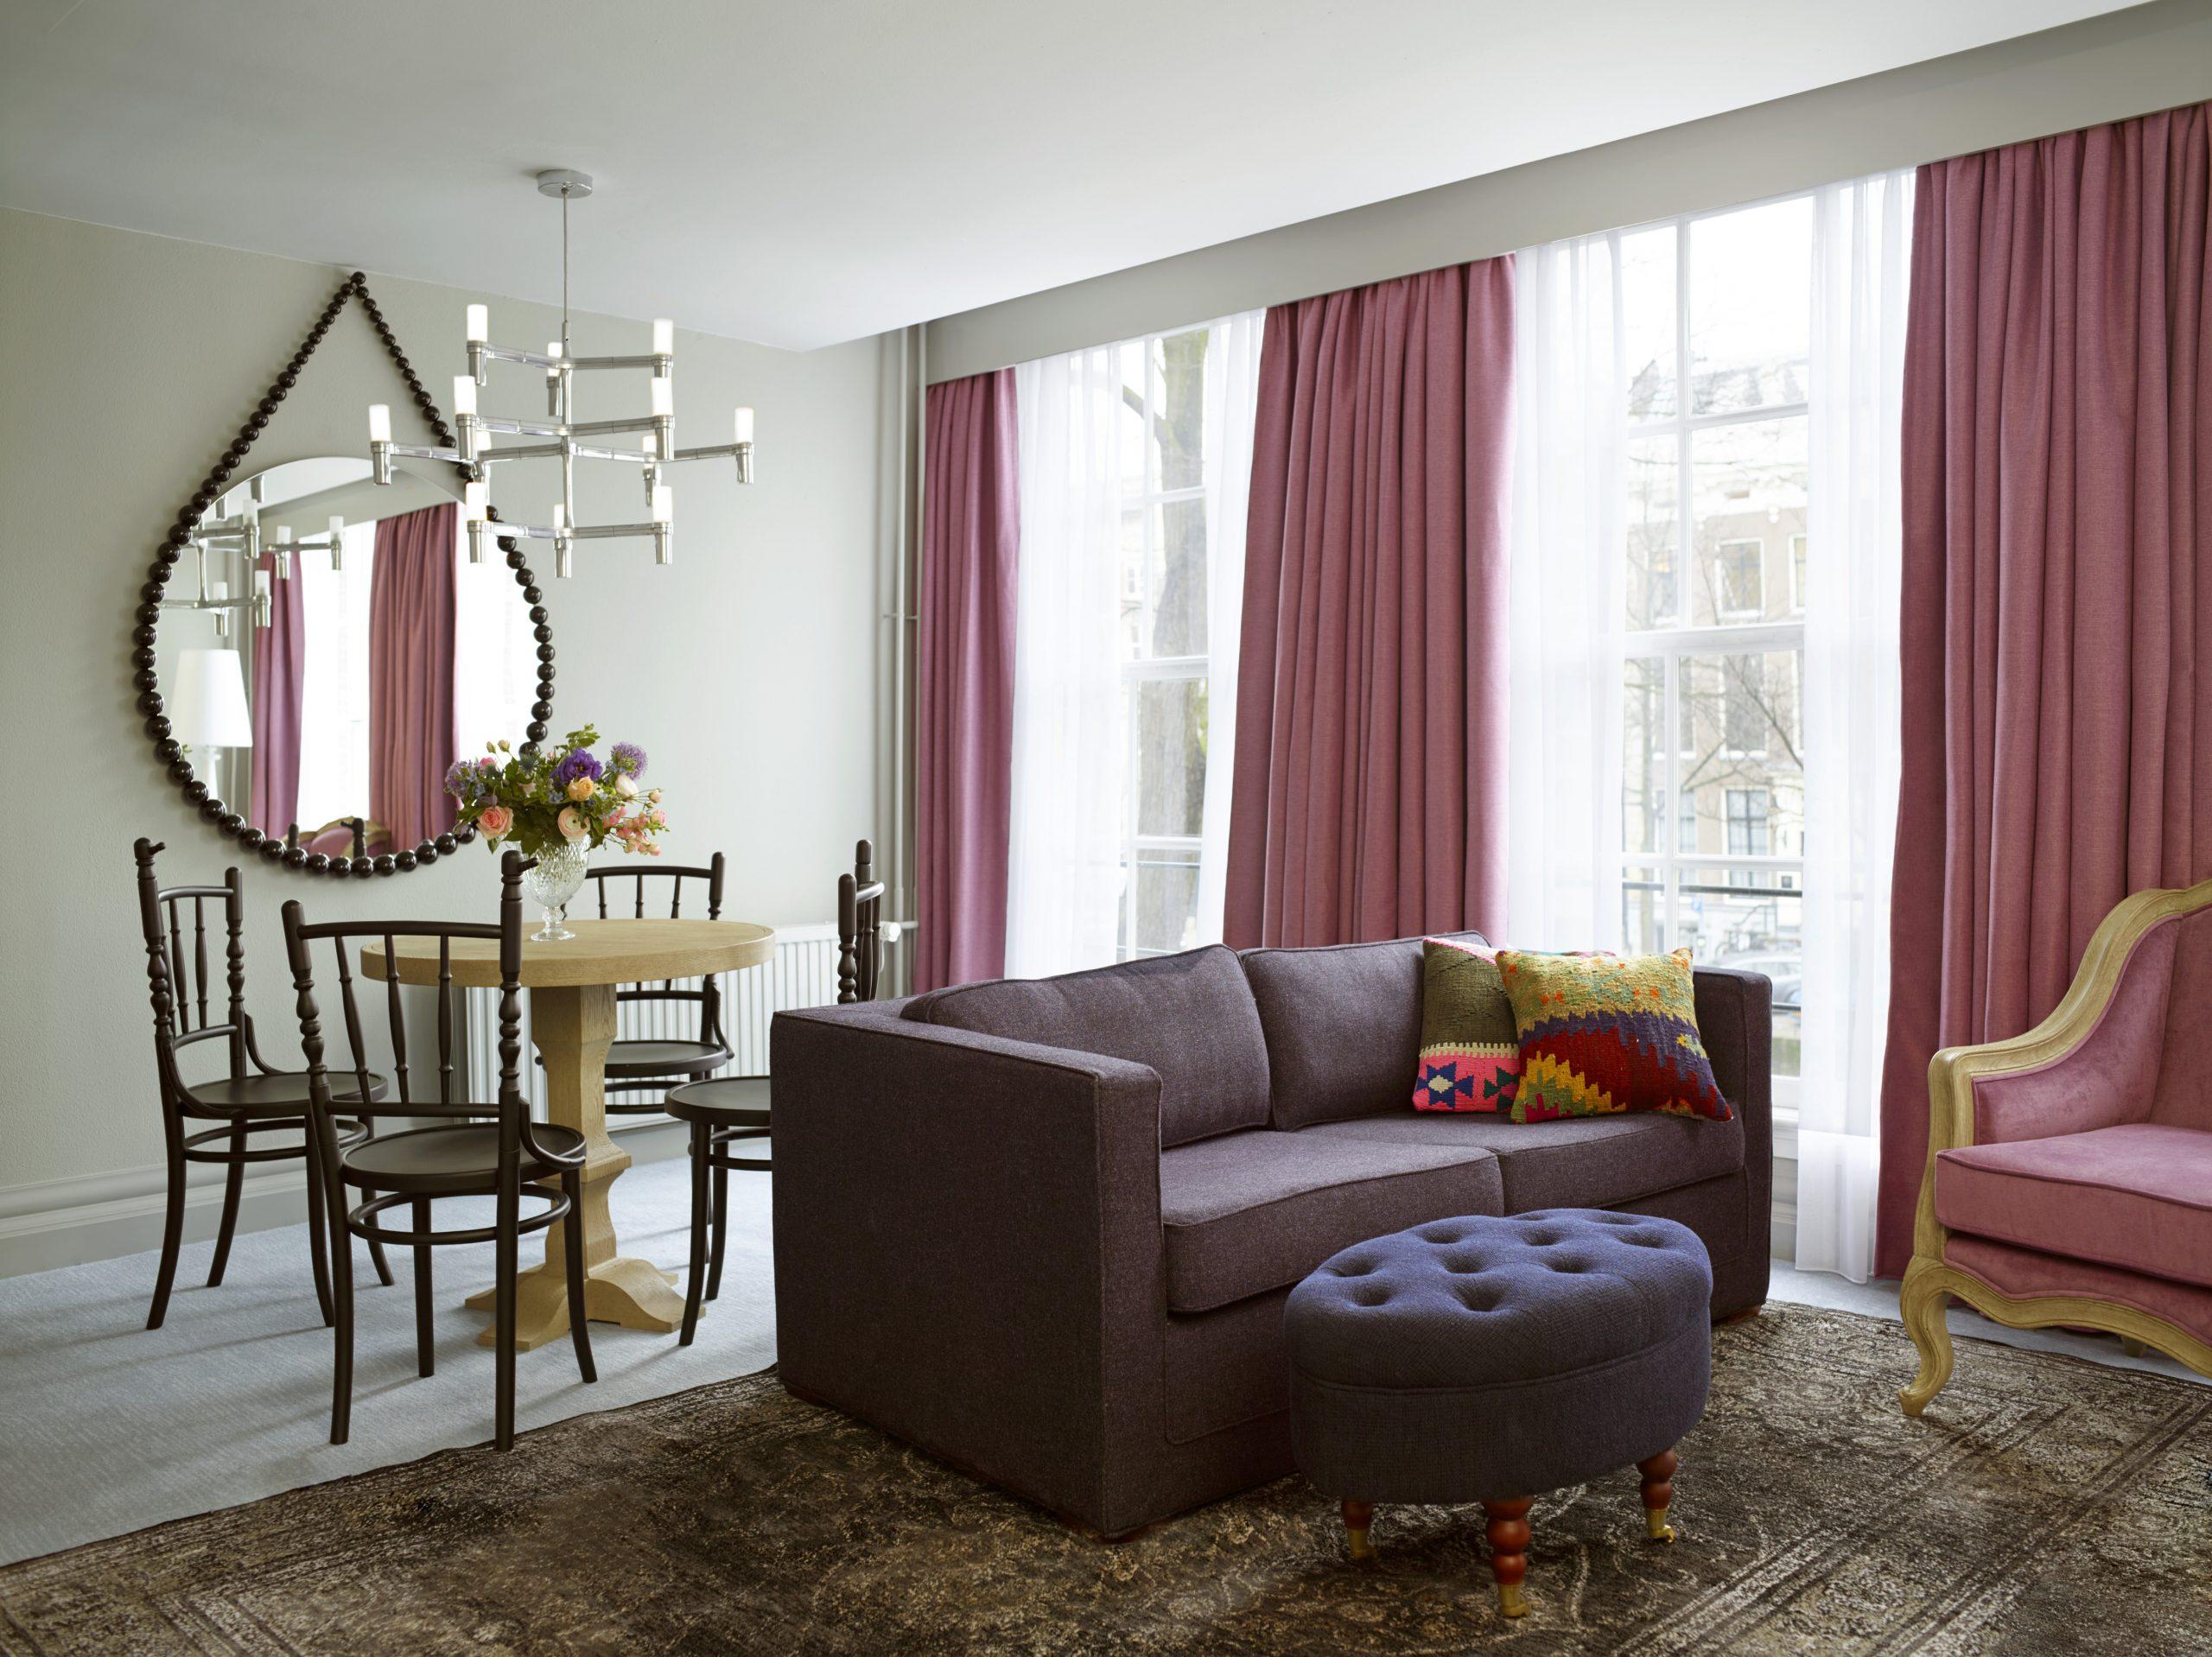 Rooms - Cosy Suite